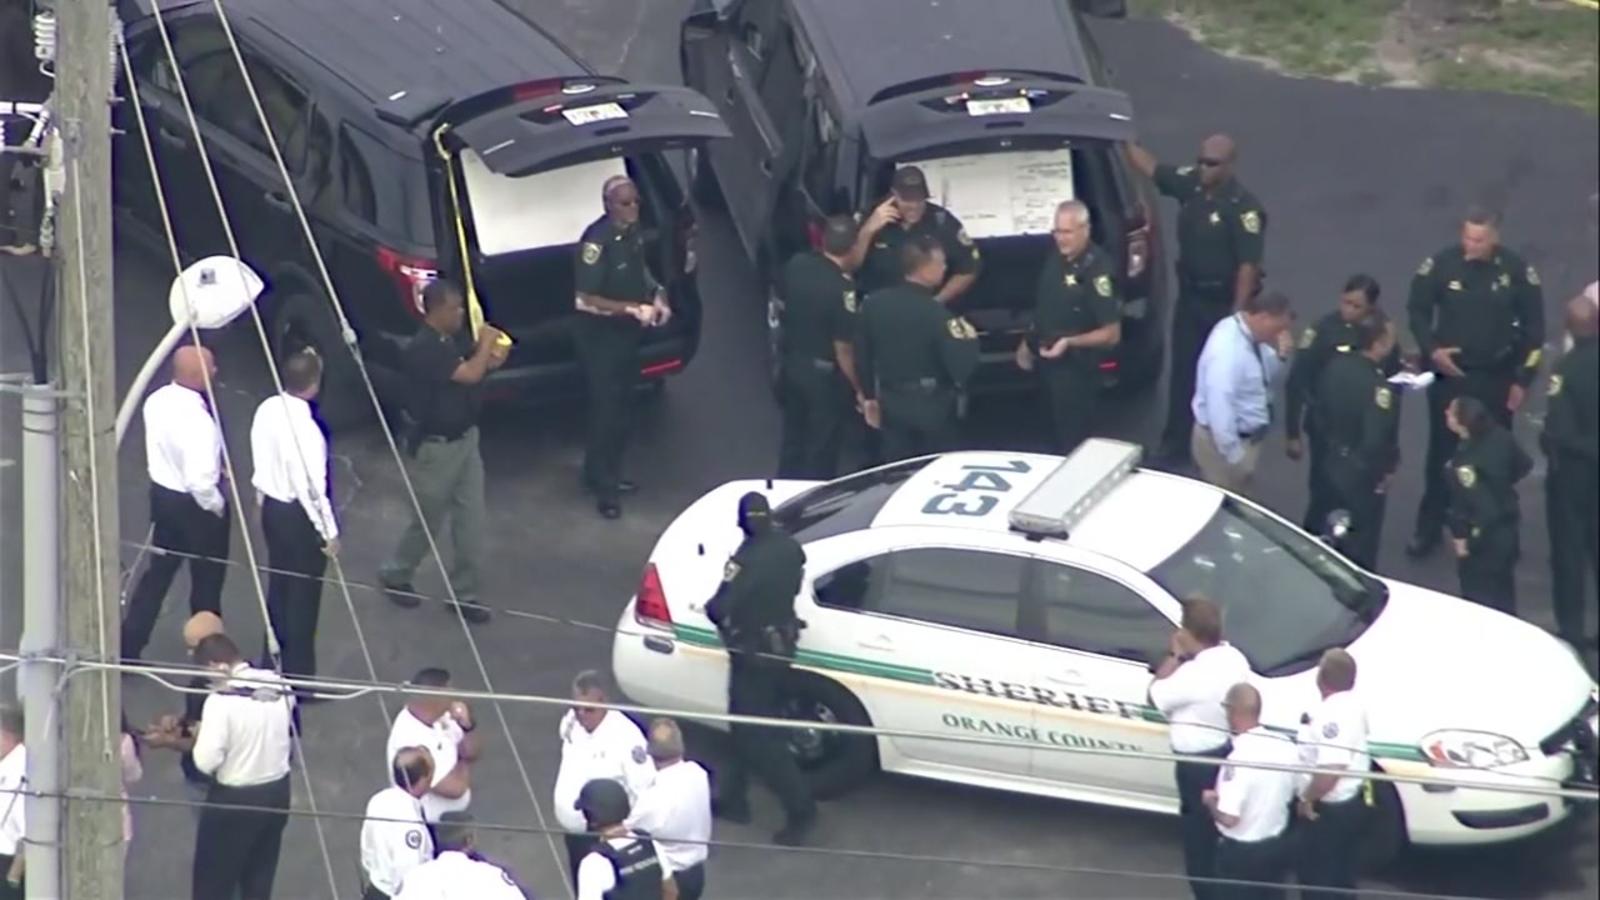 Disgruntled Ex Employee Kills 4 Then Himself At Orlando